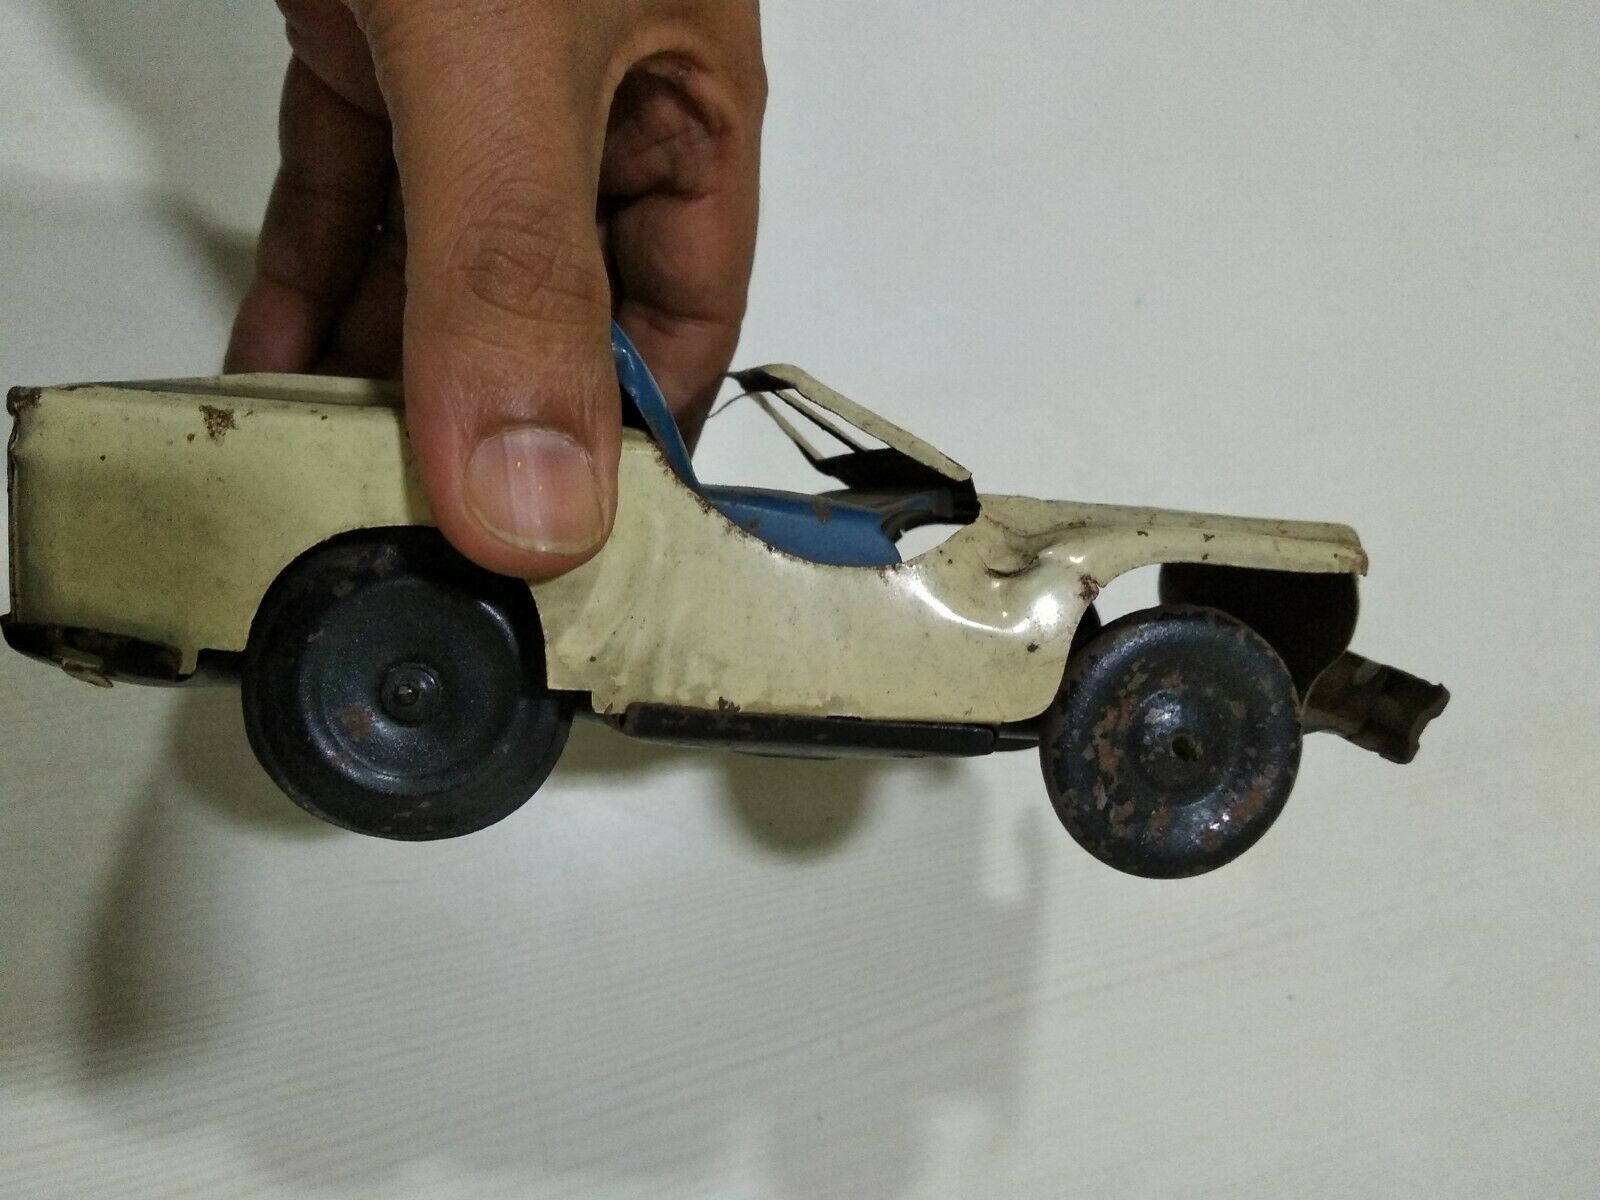 ANTIQUE VINTAGE TIN TOY rare OLD Car Vehicle Motor